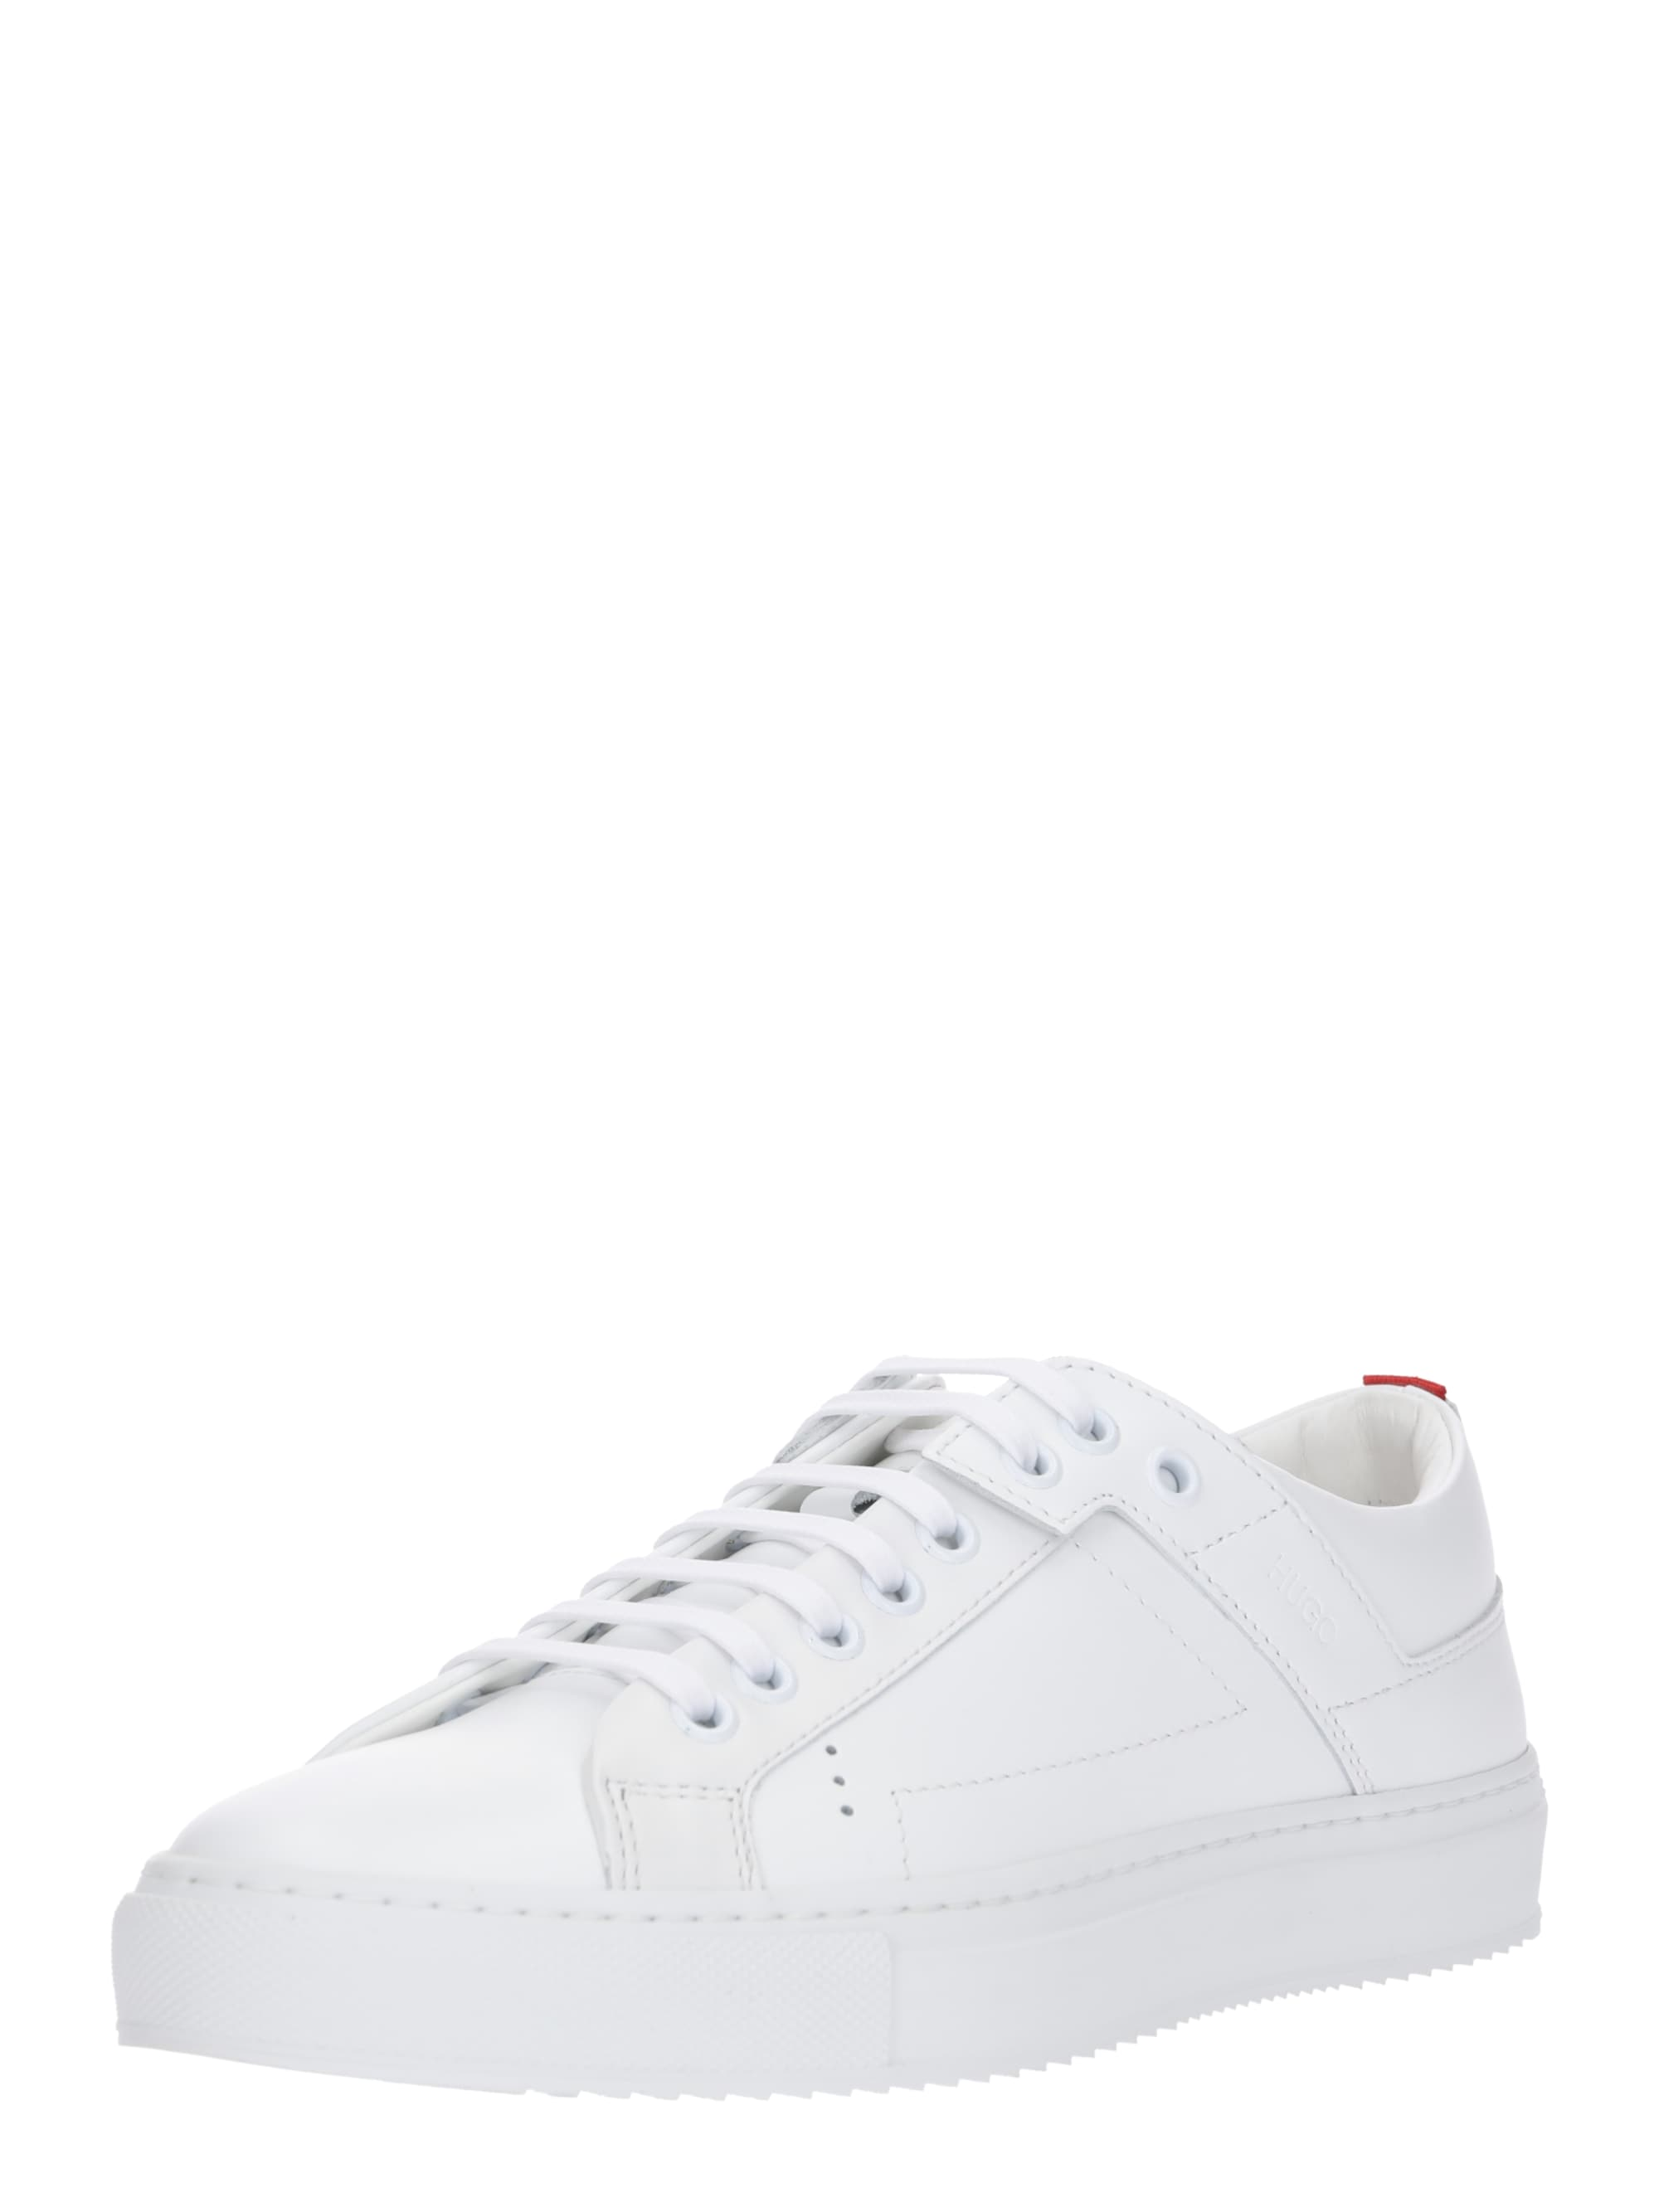 hugo - Sneaker ´Futurism Low Cut-C´